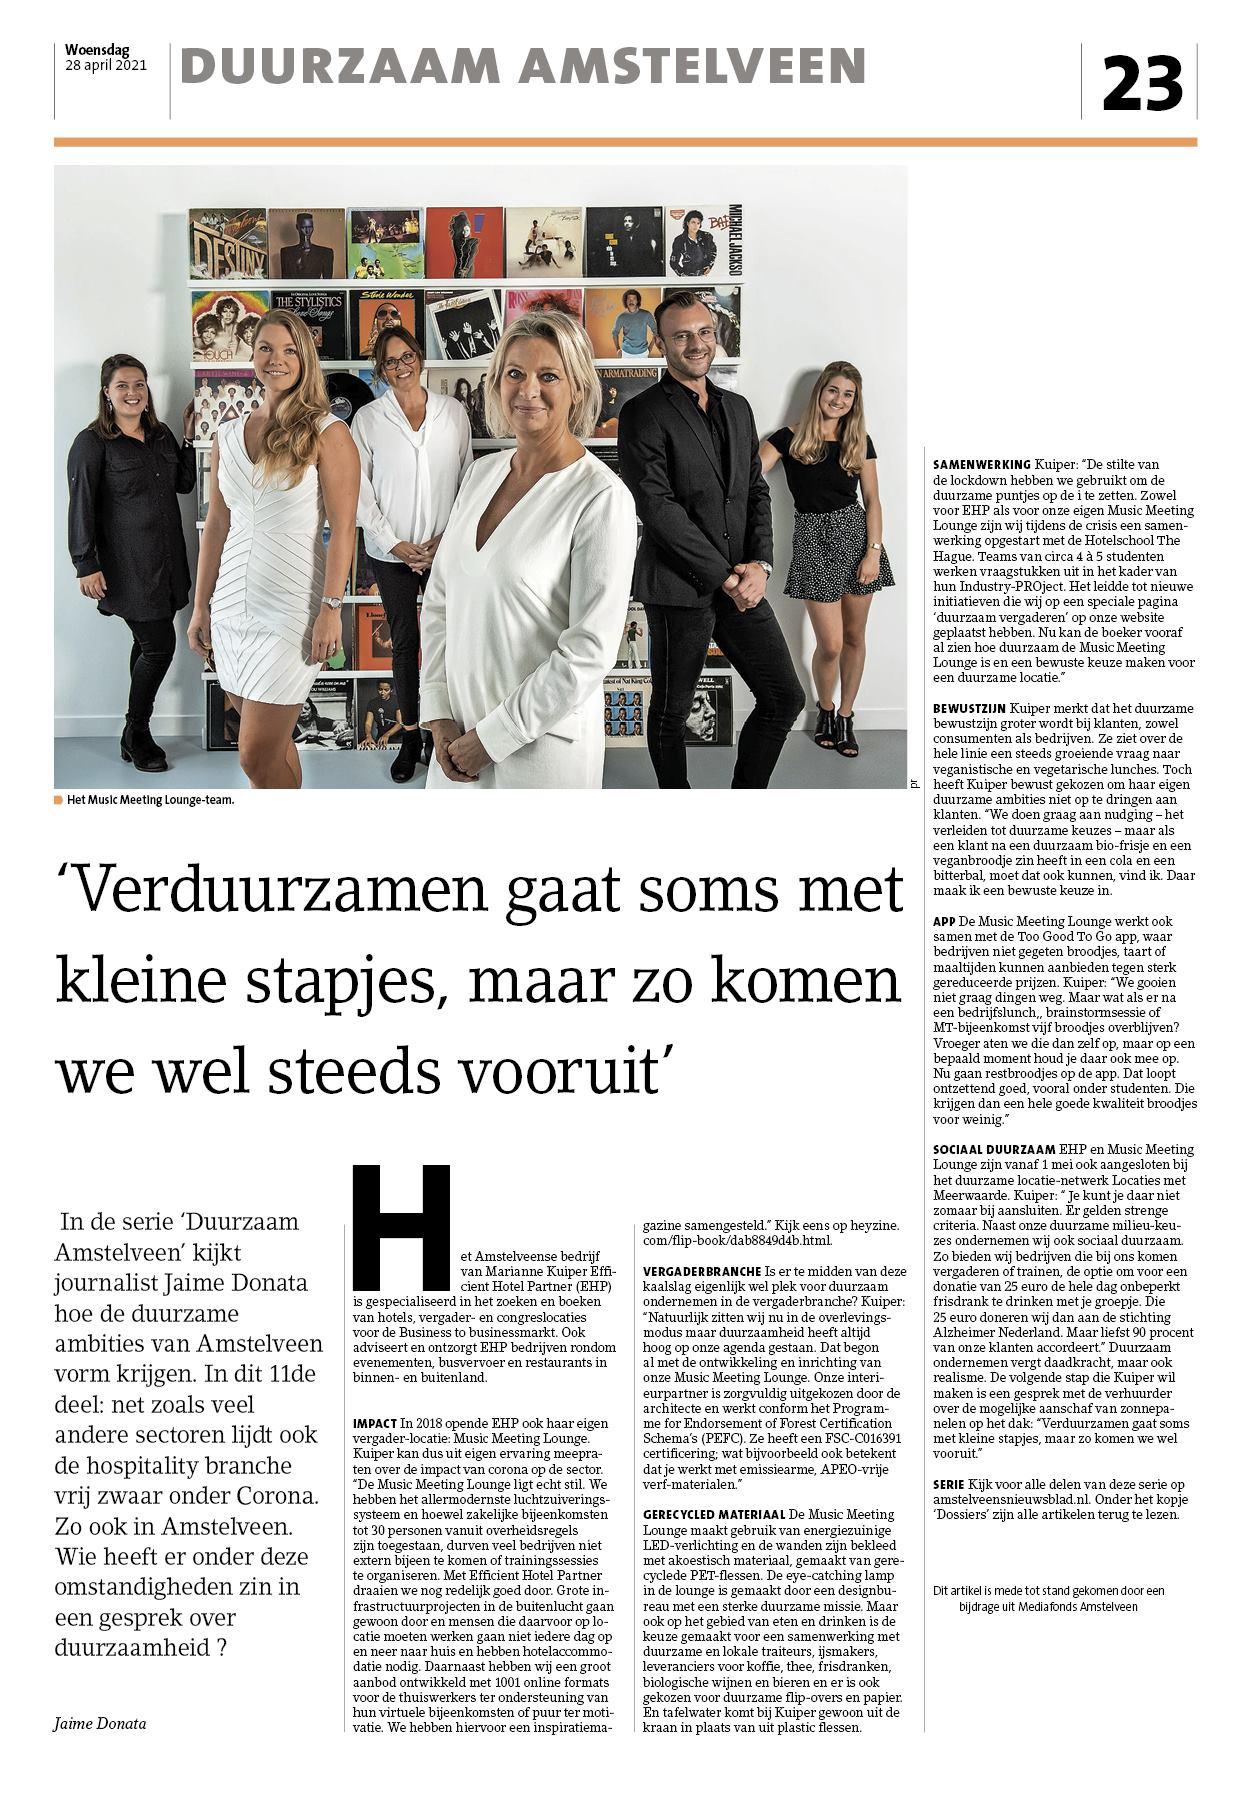 Duurzaam Amstelveen | Music Meeting Lounge